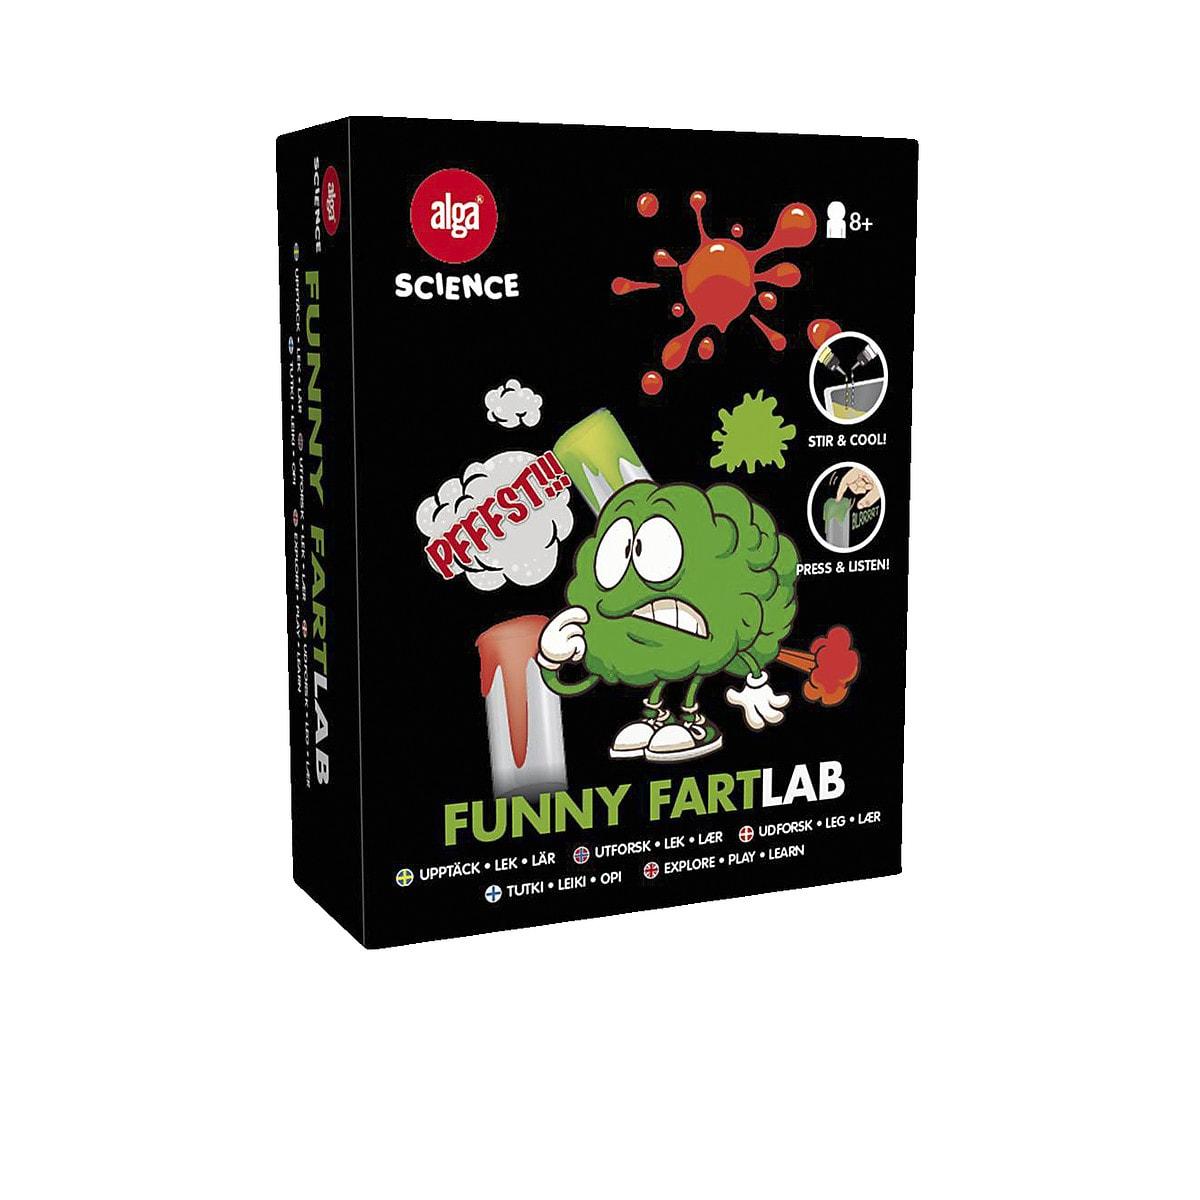 Funny Fart Lab Alga Science